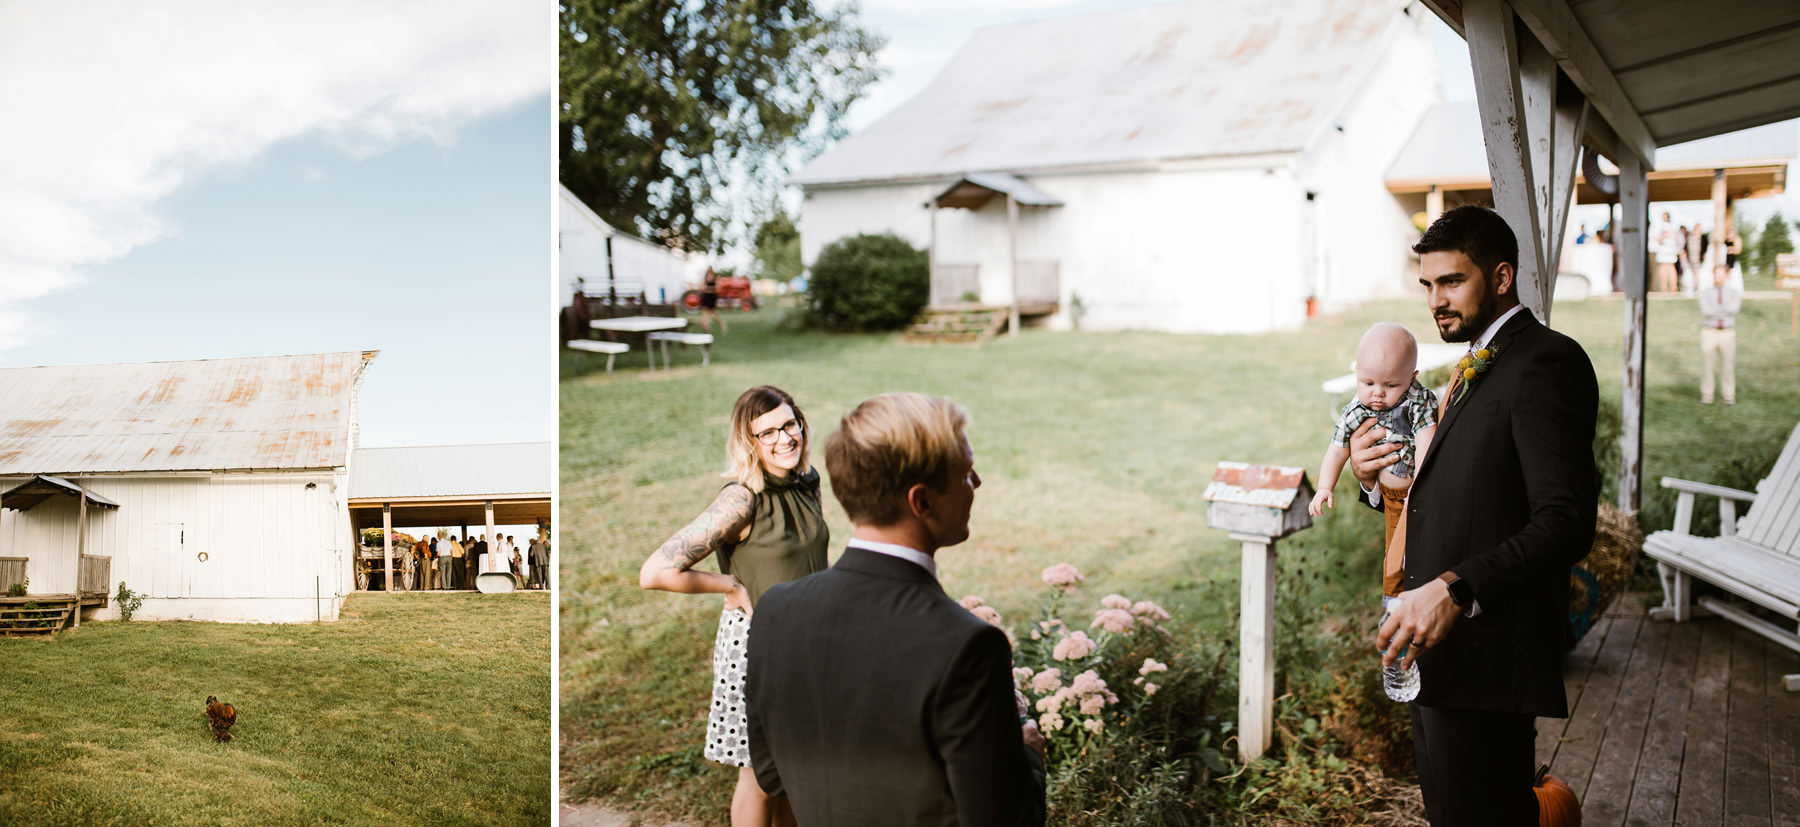 Alldredge Orchard Kansas City_Kindling Wedding Photography BLOG 26.JPG